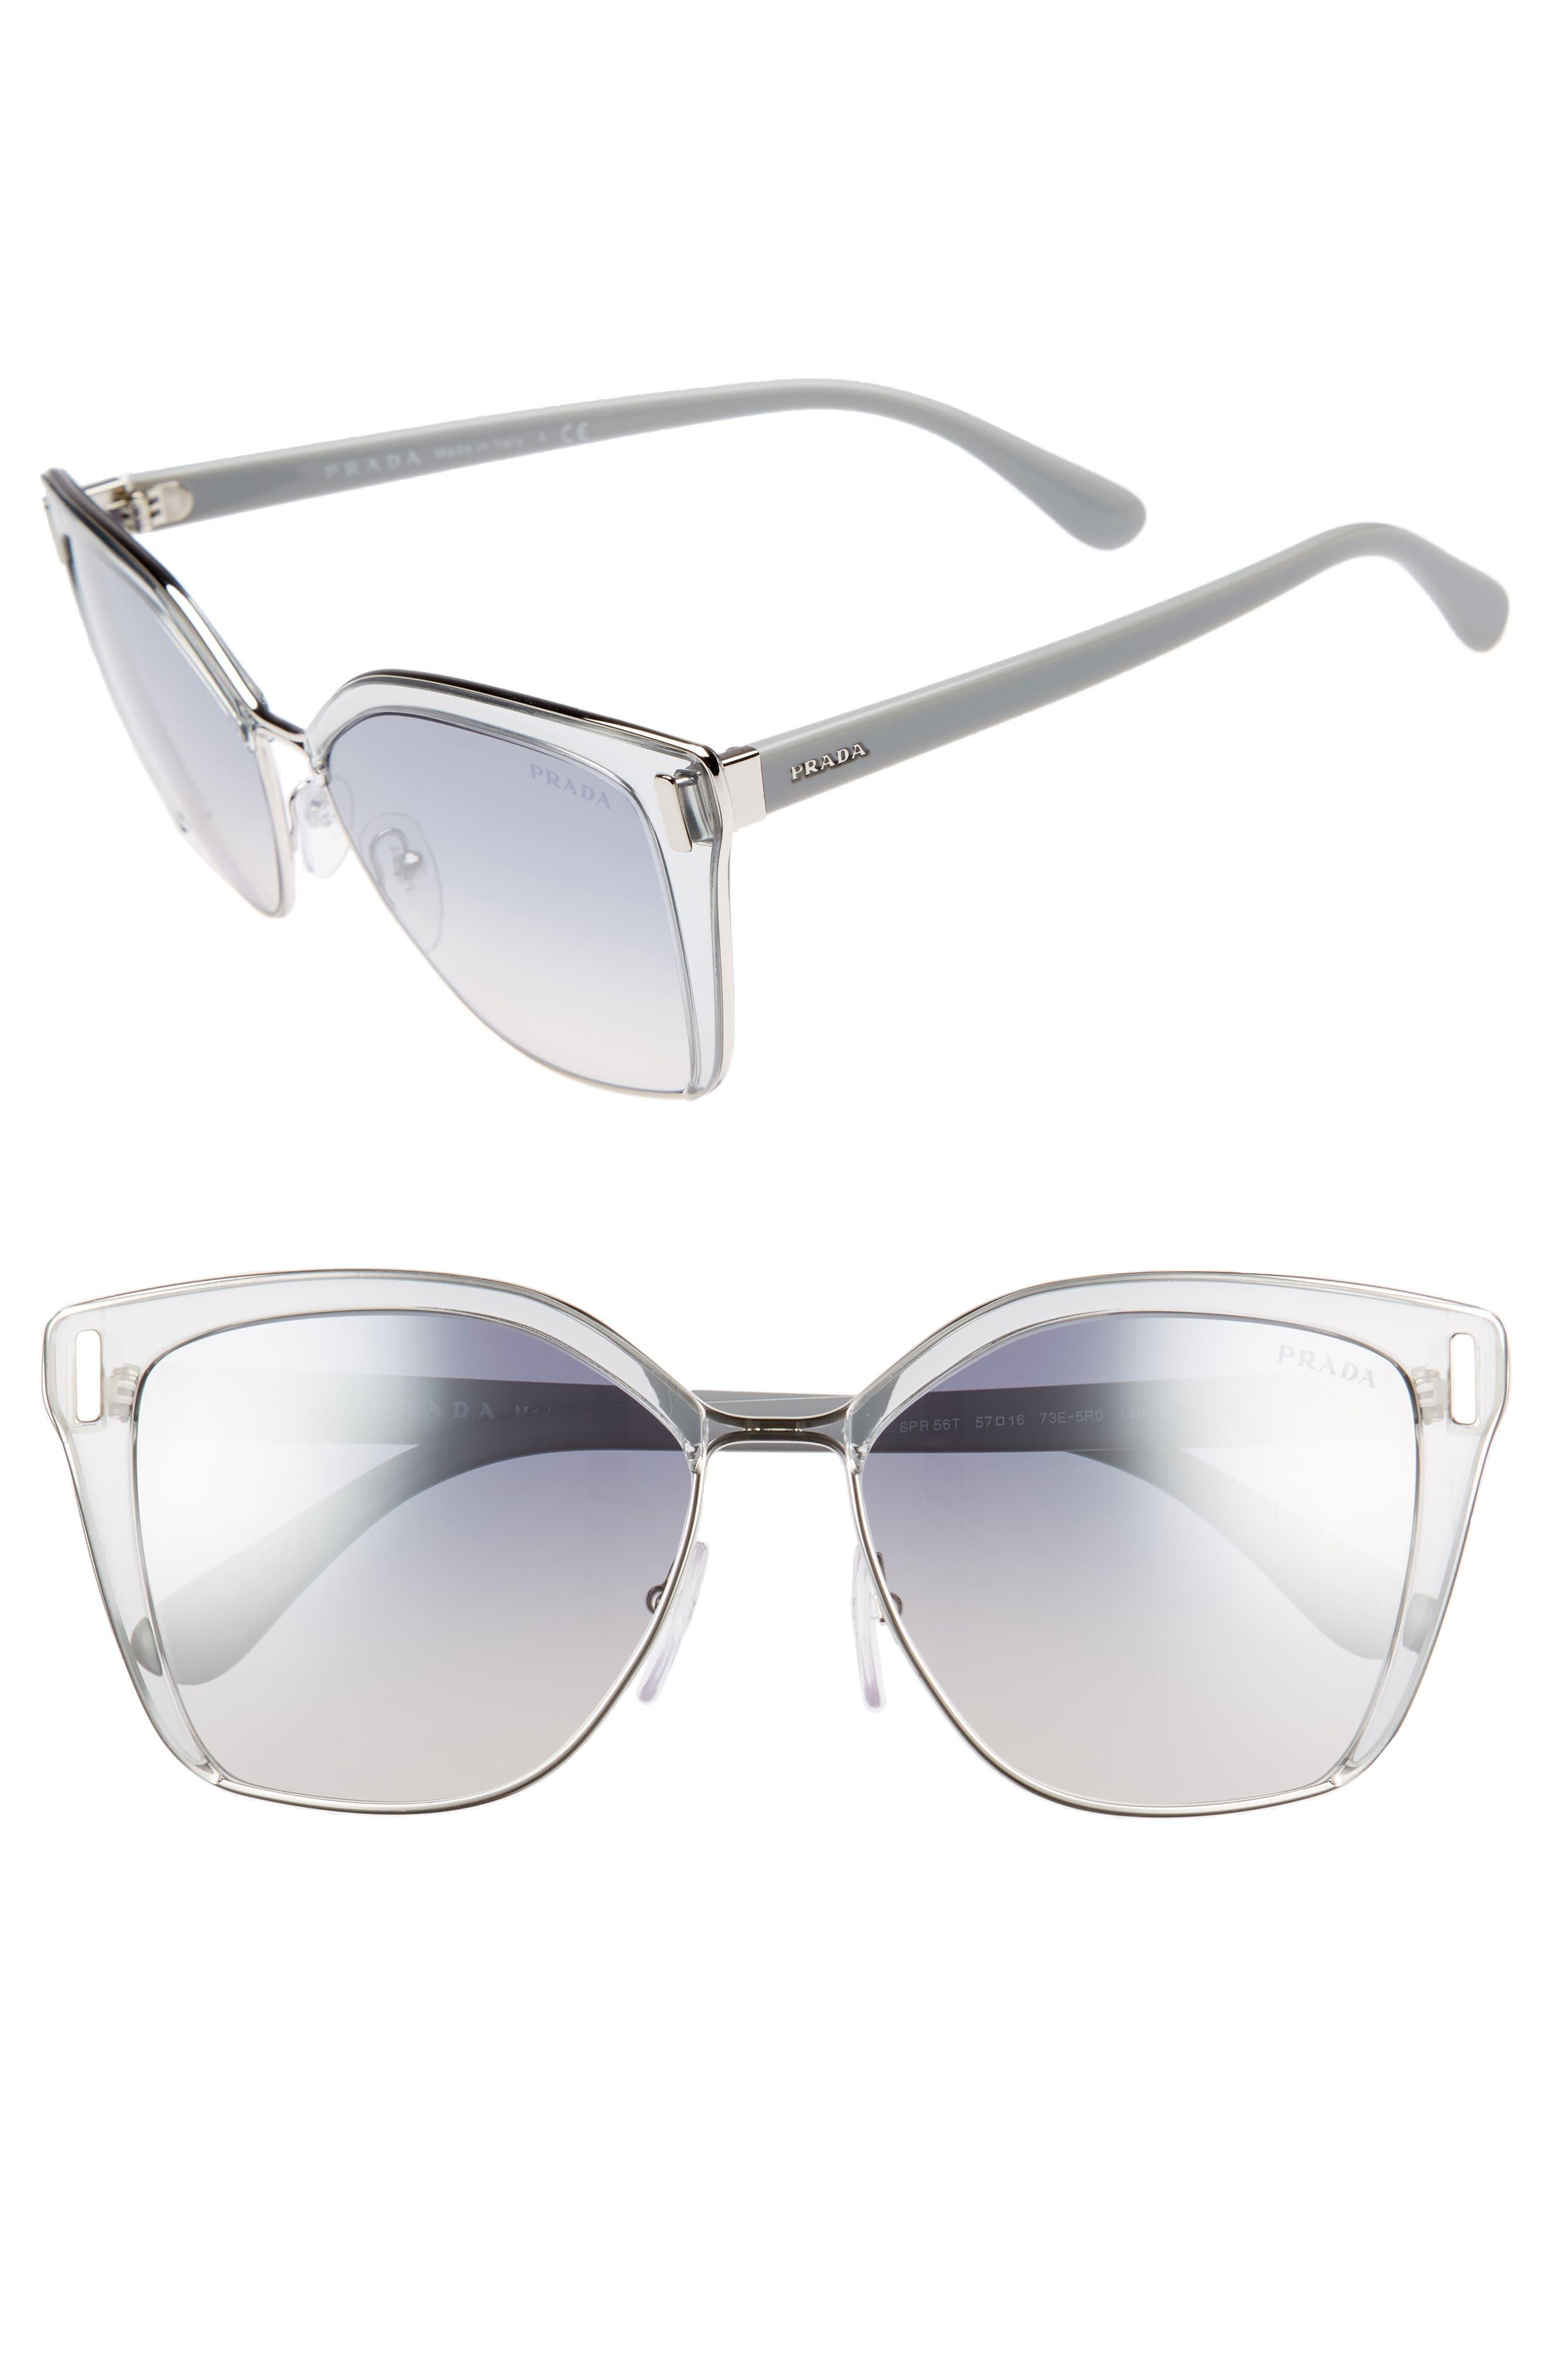 Main Image - Prada 54mm Gradient Geometric Sunglasses